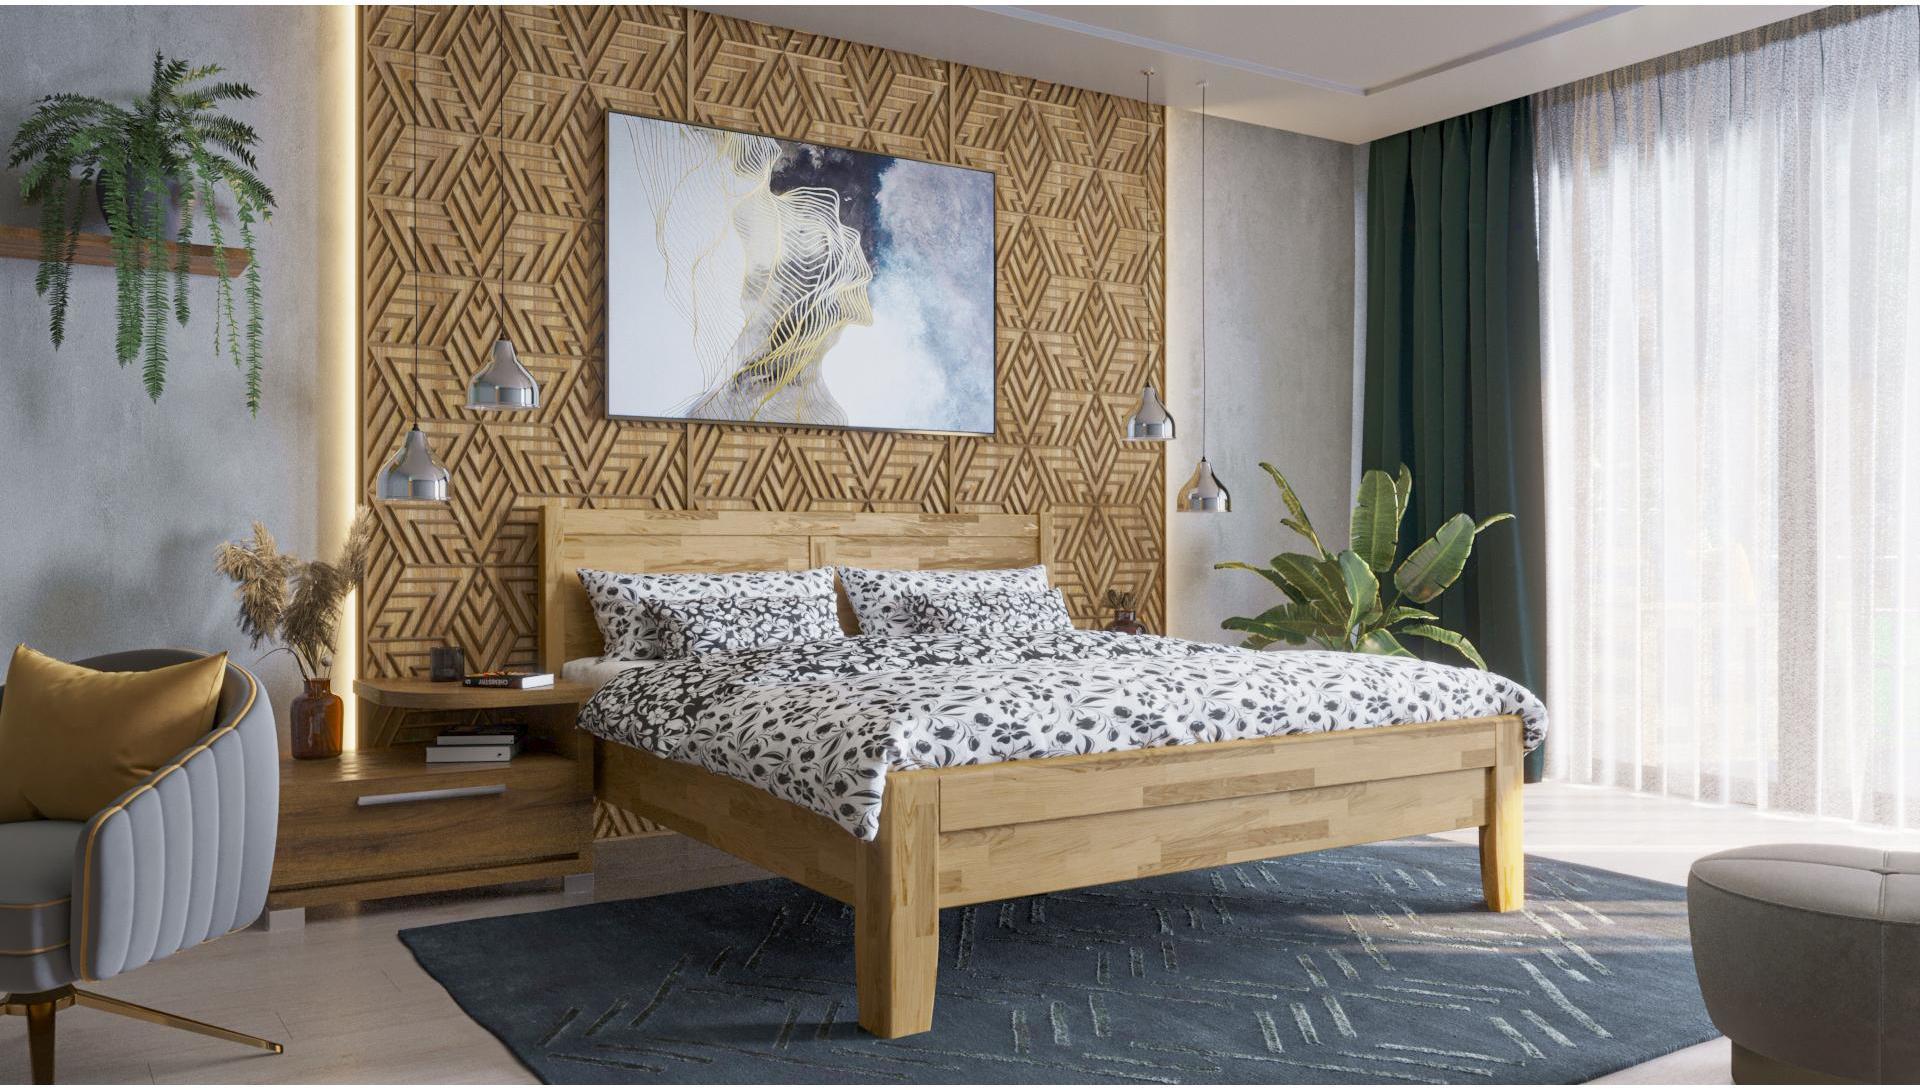 Celomasívna posteľ Celin K3 180x200 cm dub D1